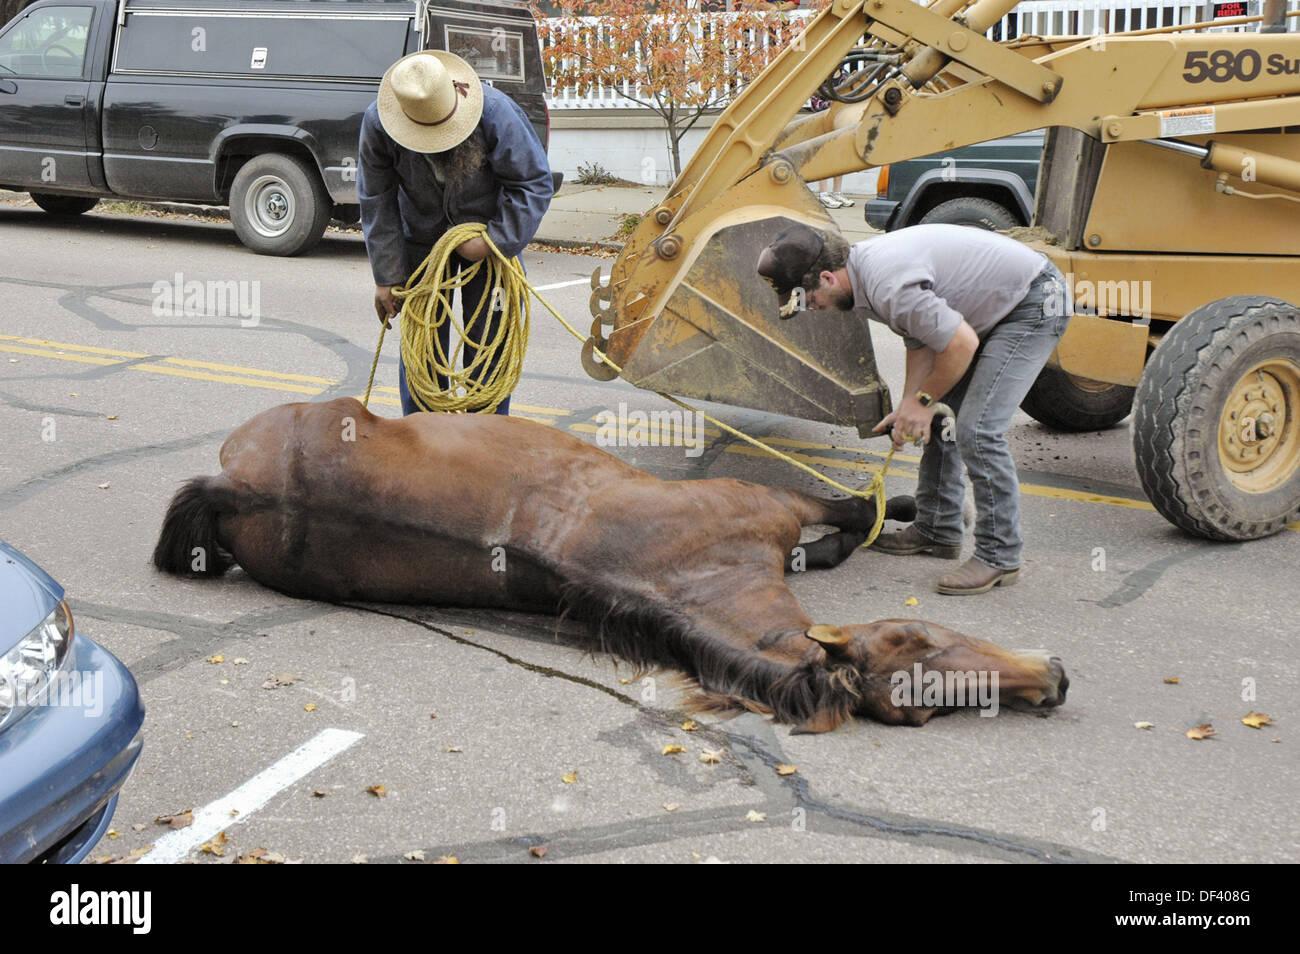 Horse Car Crash